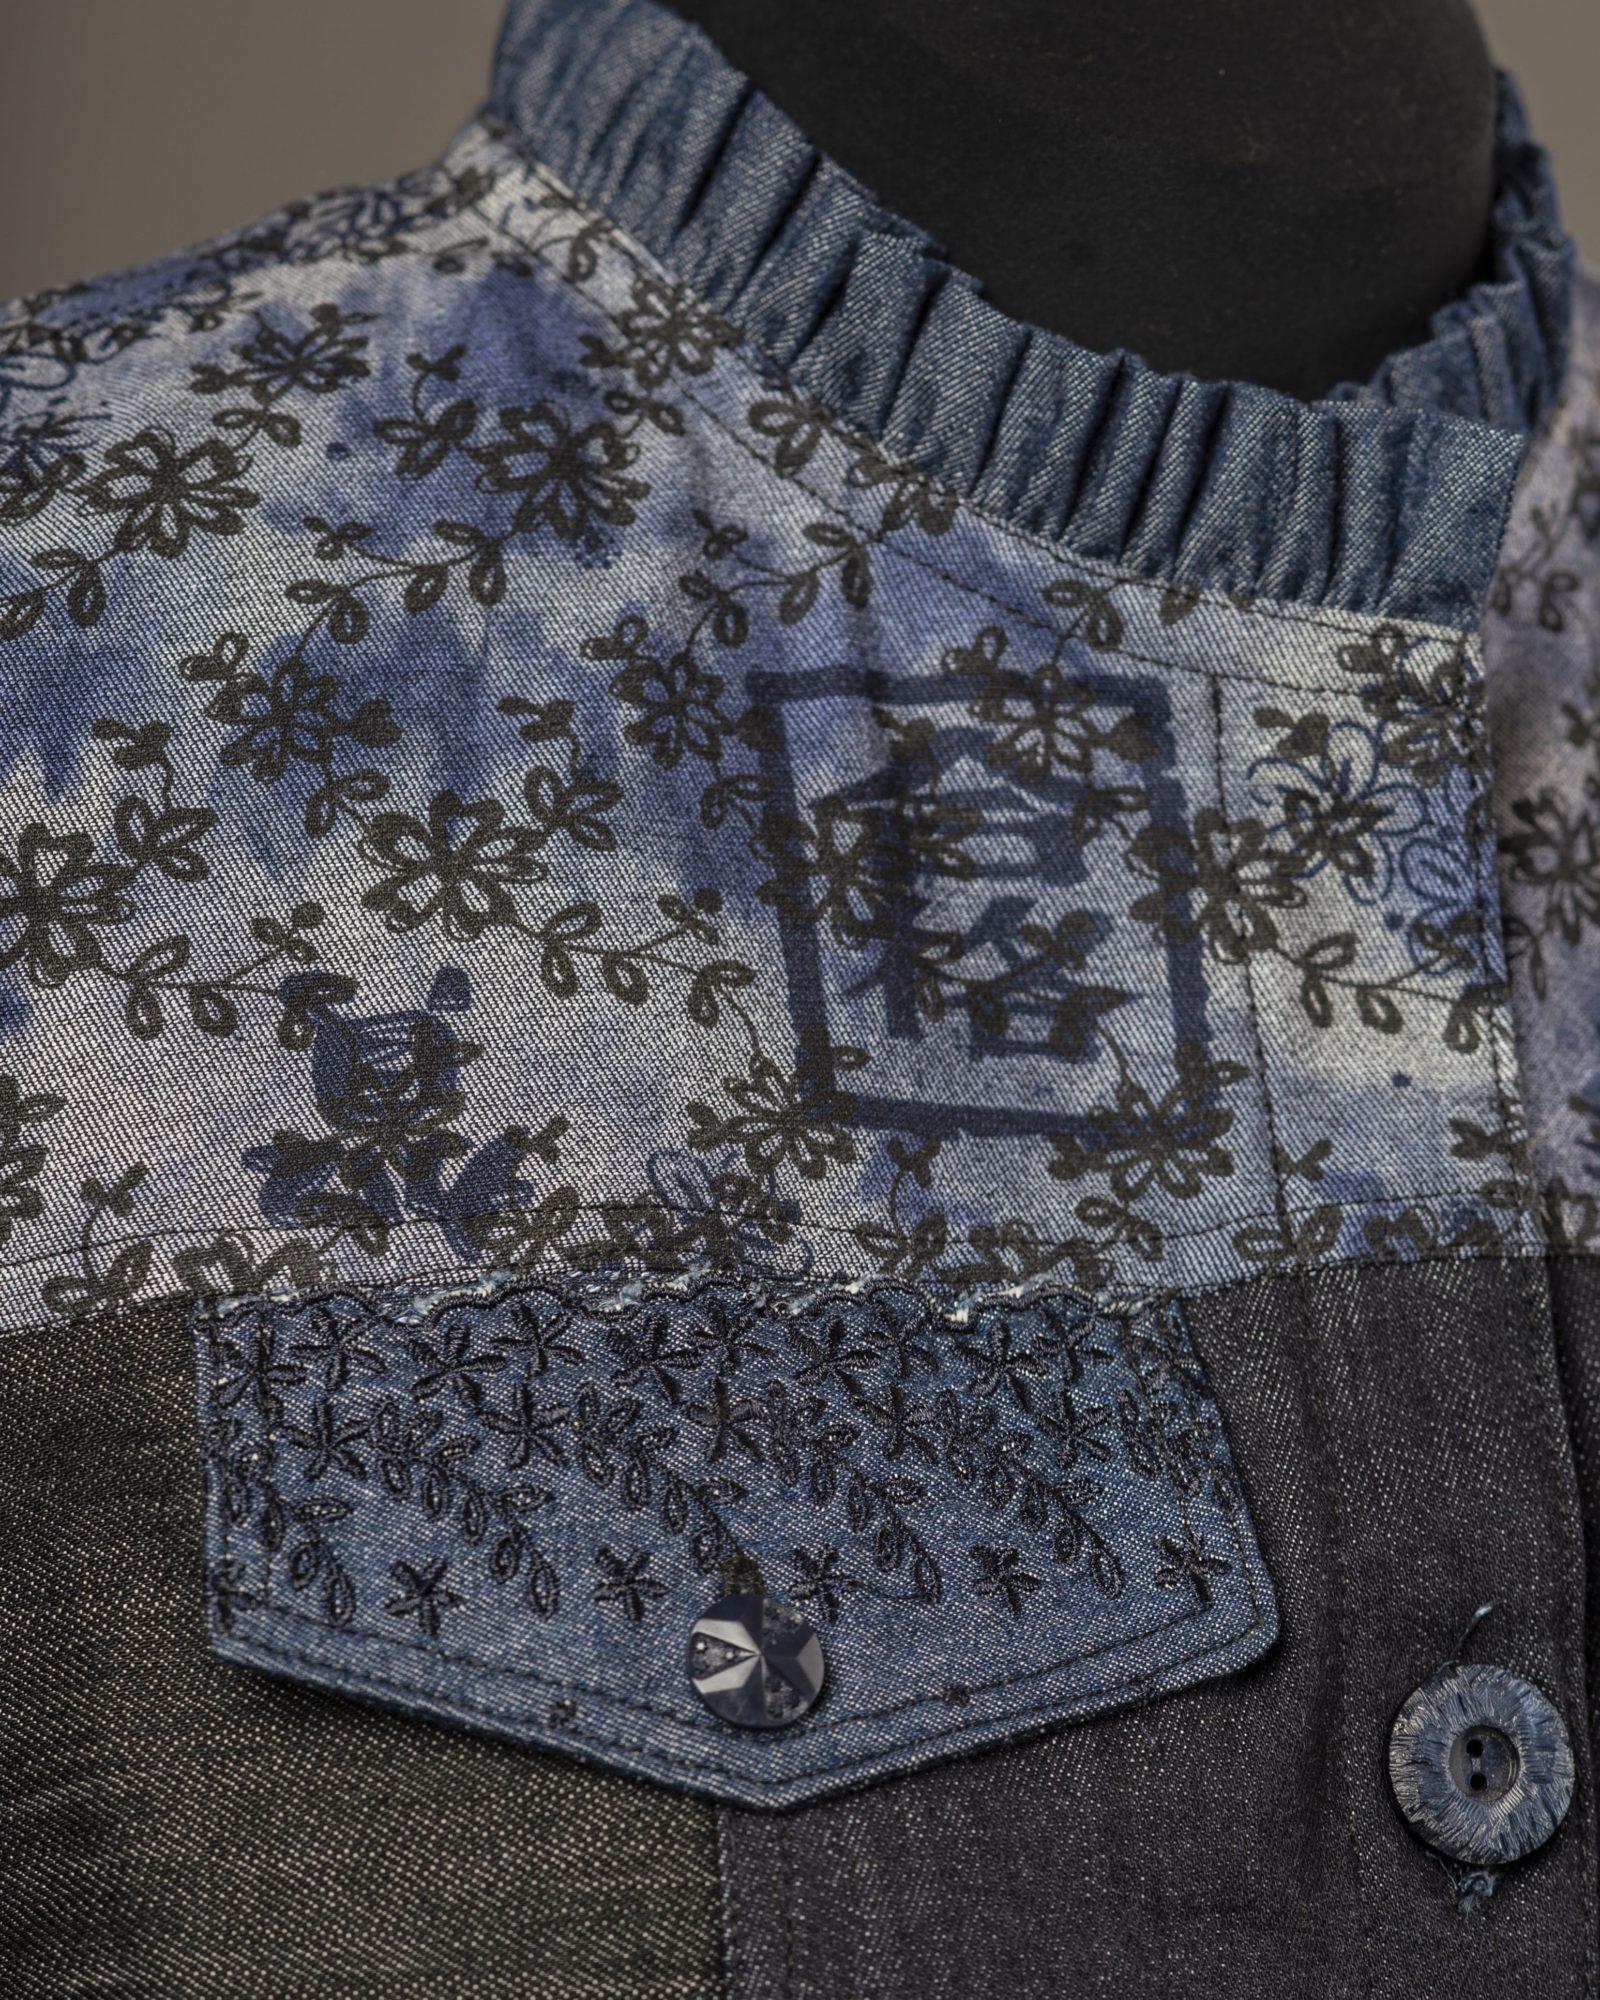 Ruffle collar detail